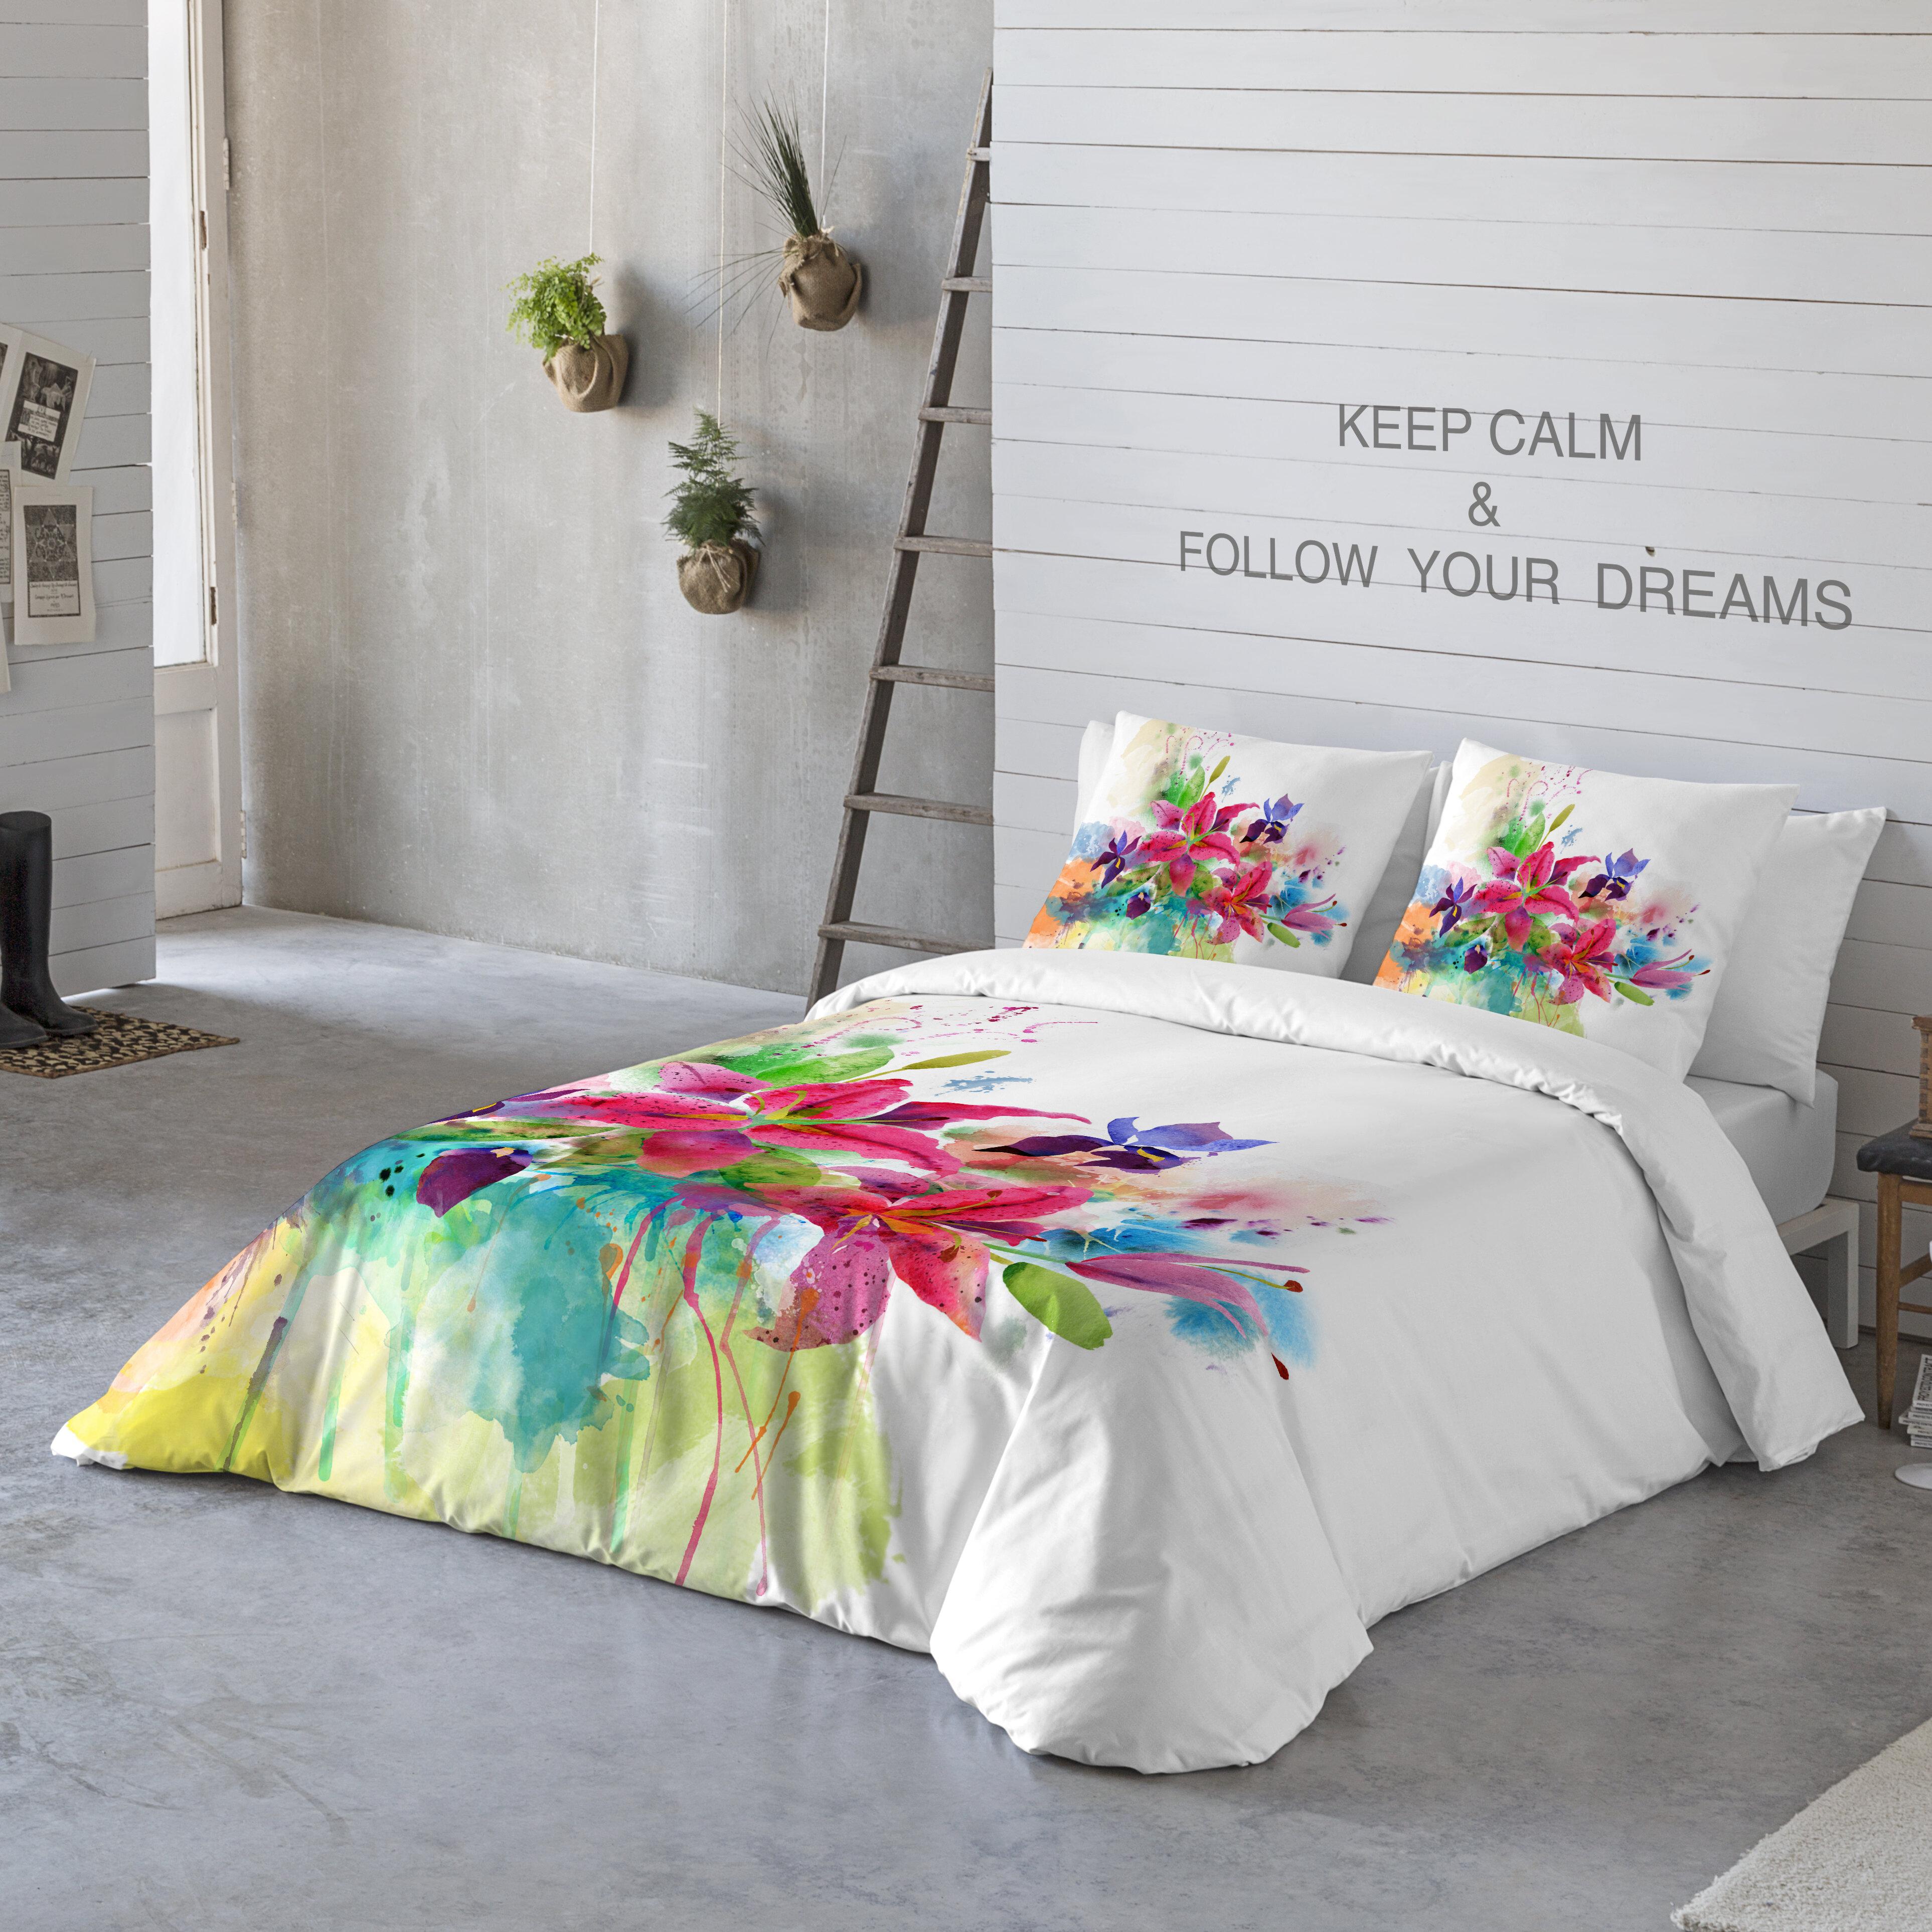 eternal duvet adams duvets comforter jennifer products luxury covers classic cover